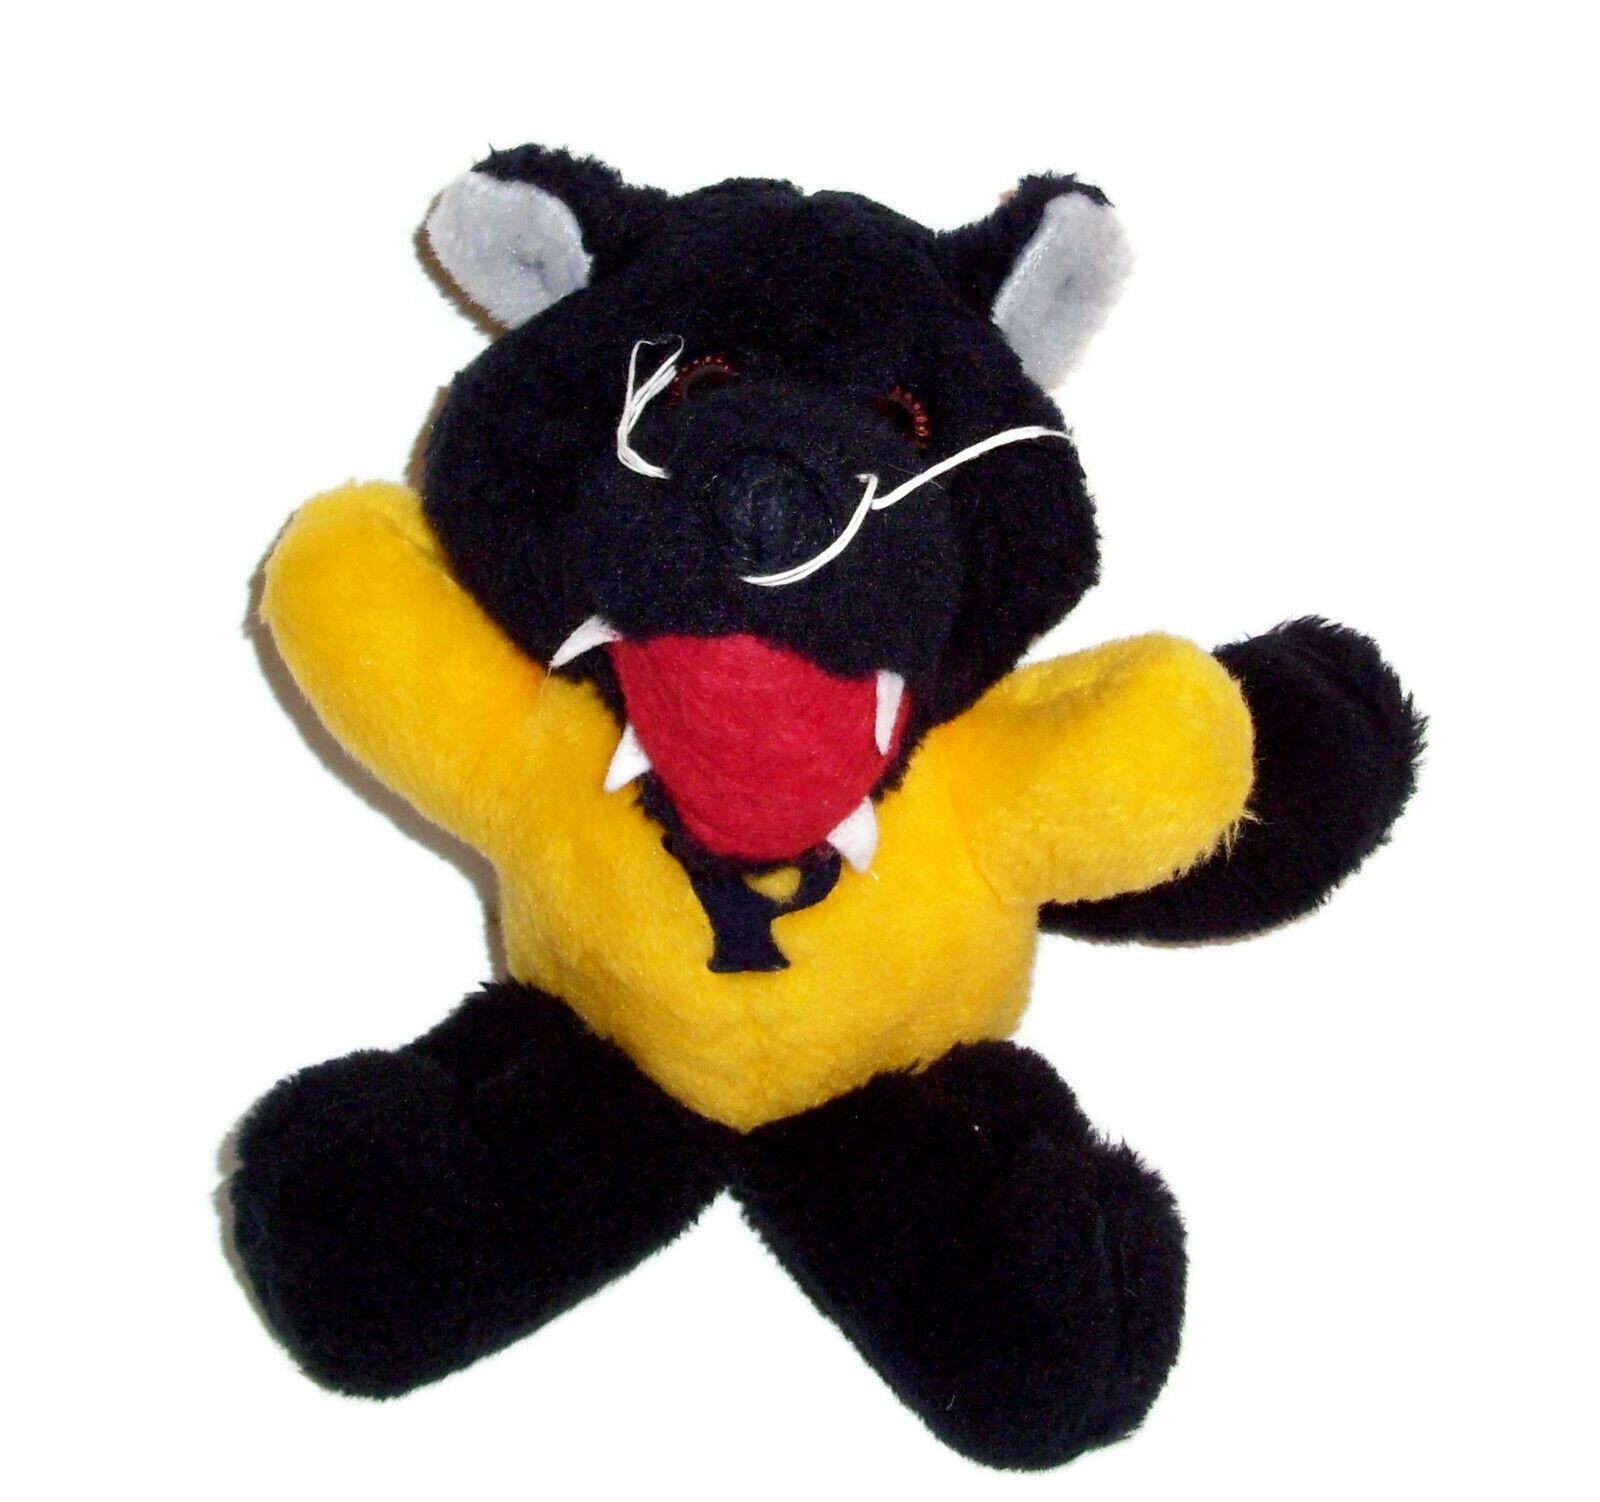 VTG Commonwealth 1984 P Mascot Gituttio Pantera Nera Jaguar animalii impanati